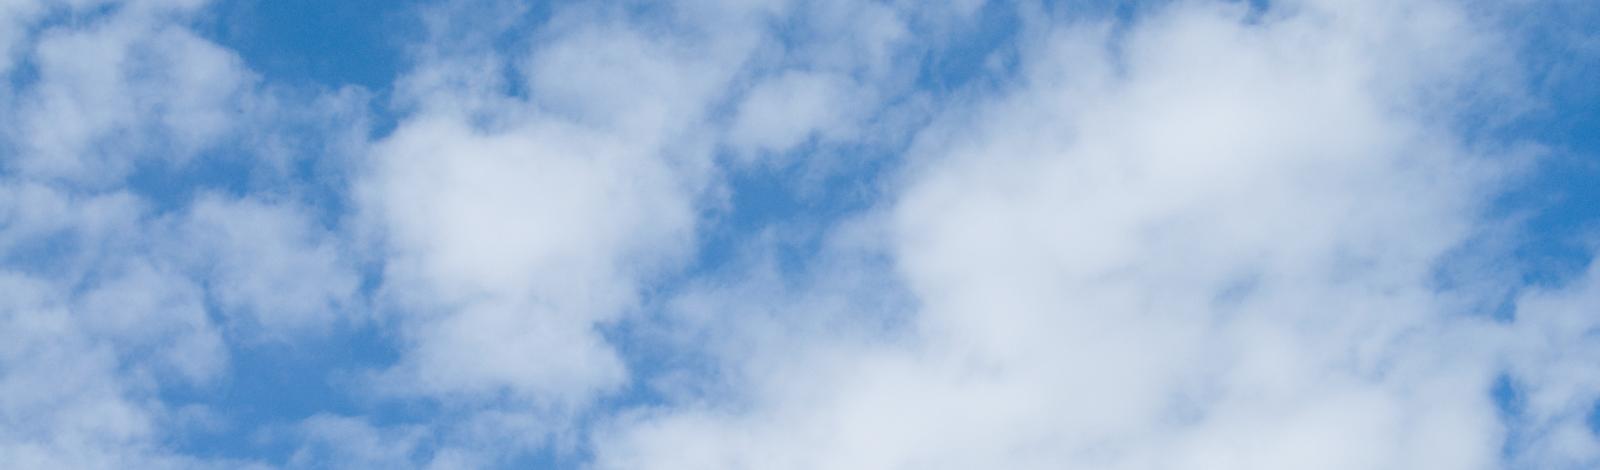 sky_background